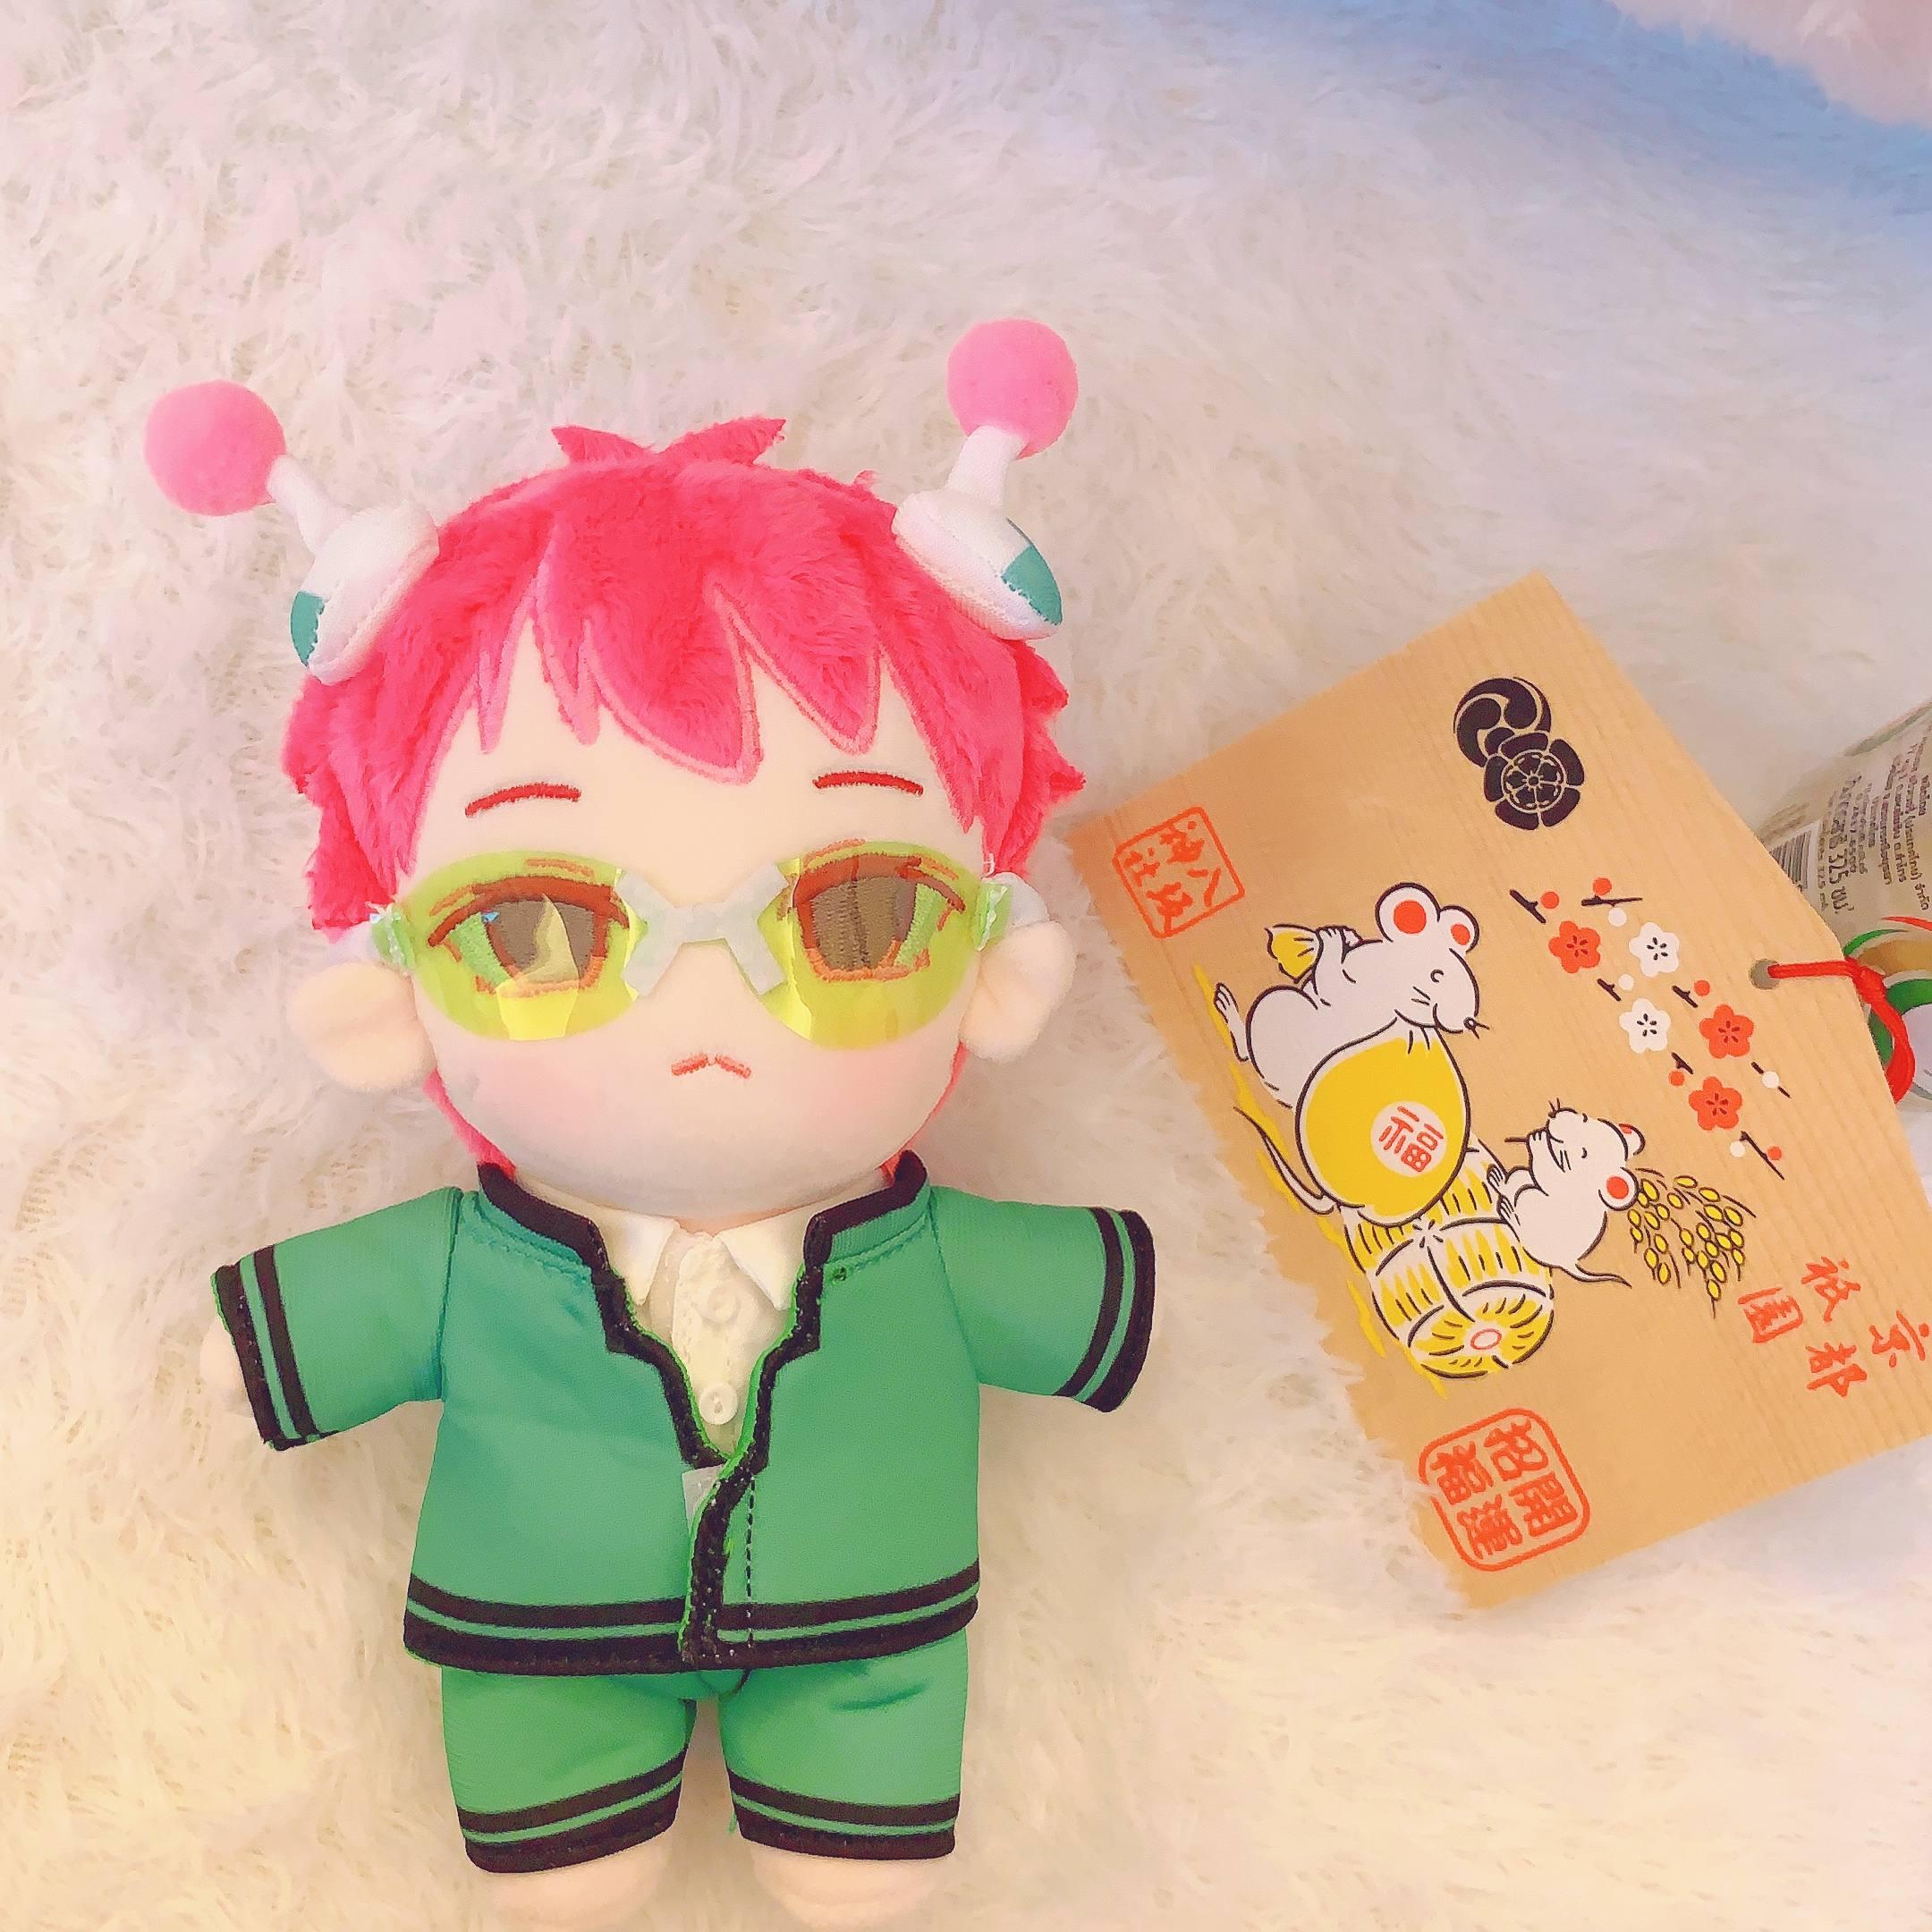 Plushie Doll Gift Saiki Anime Disastrous-Life Cosplay Cute 20cm Toy Stuffed of Kusuo